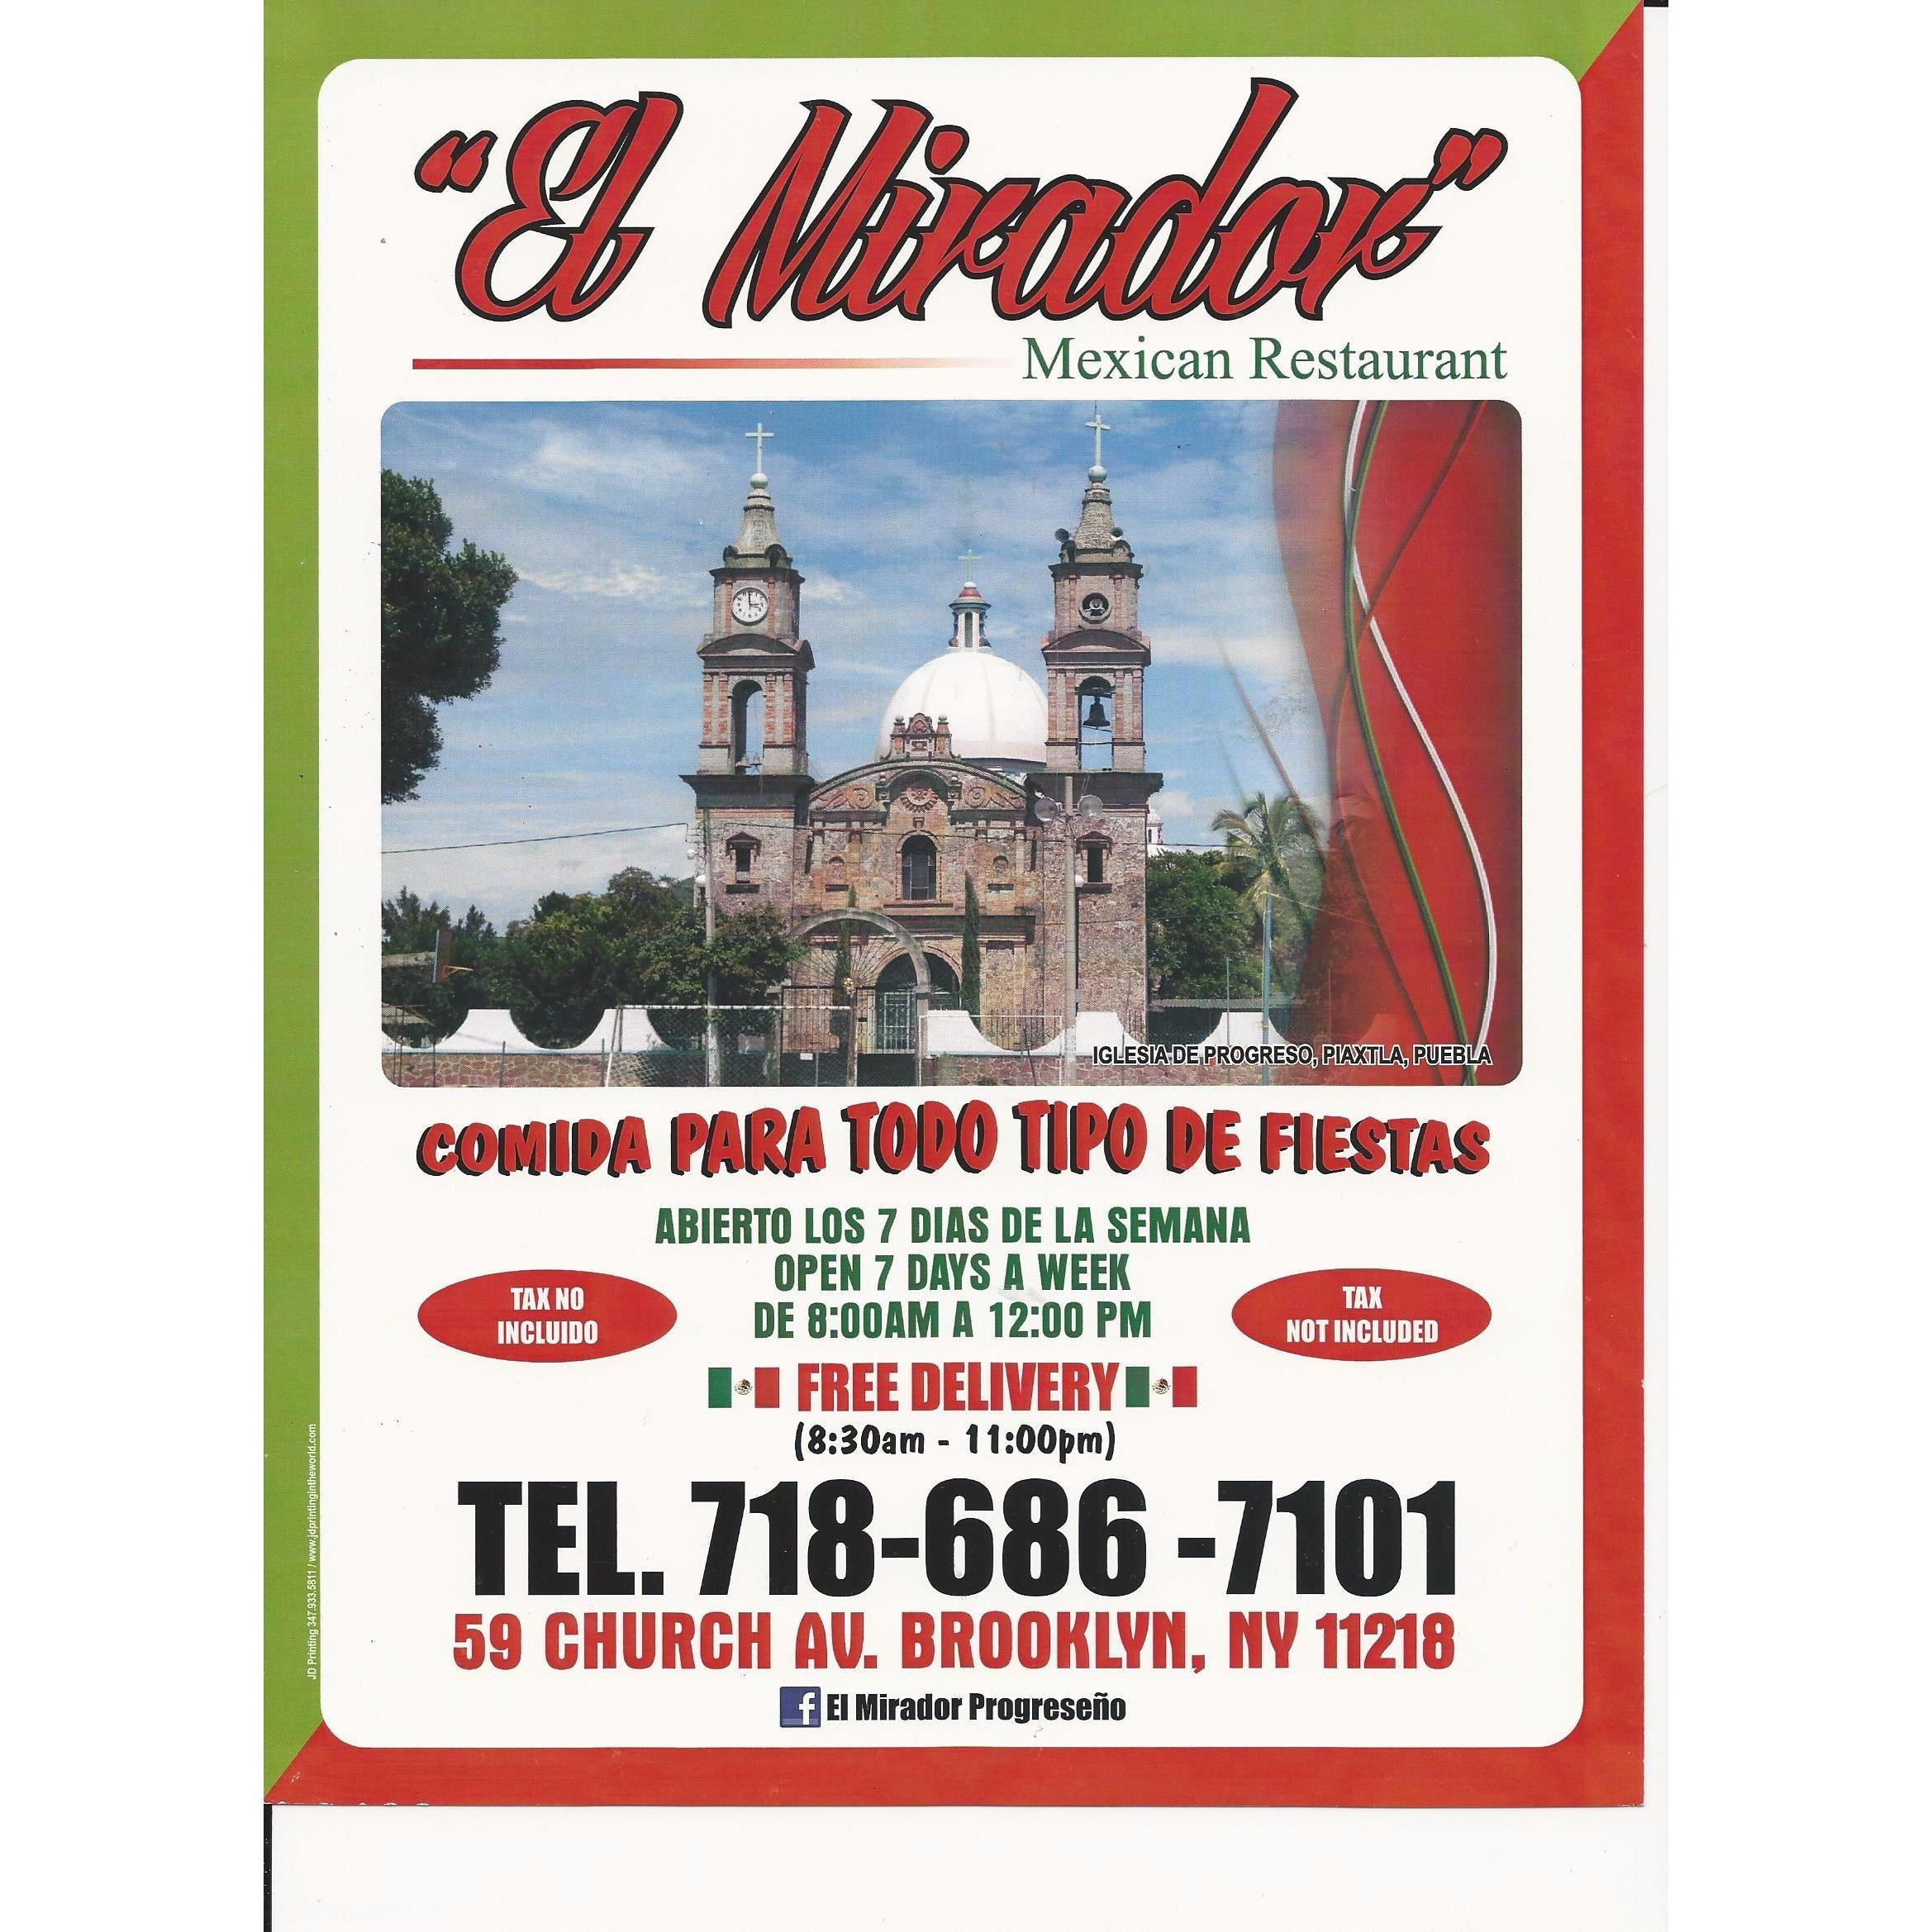 El Mirador Mexican Restaurant